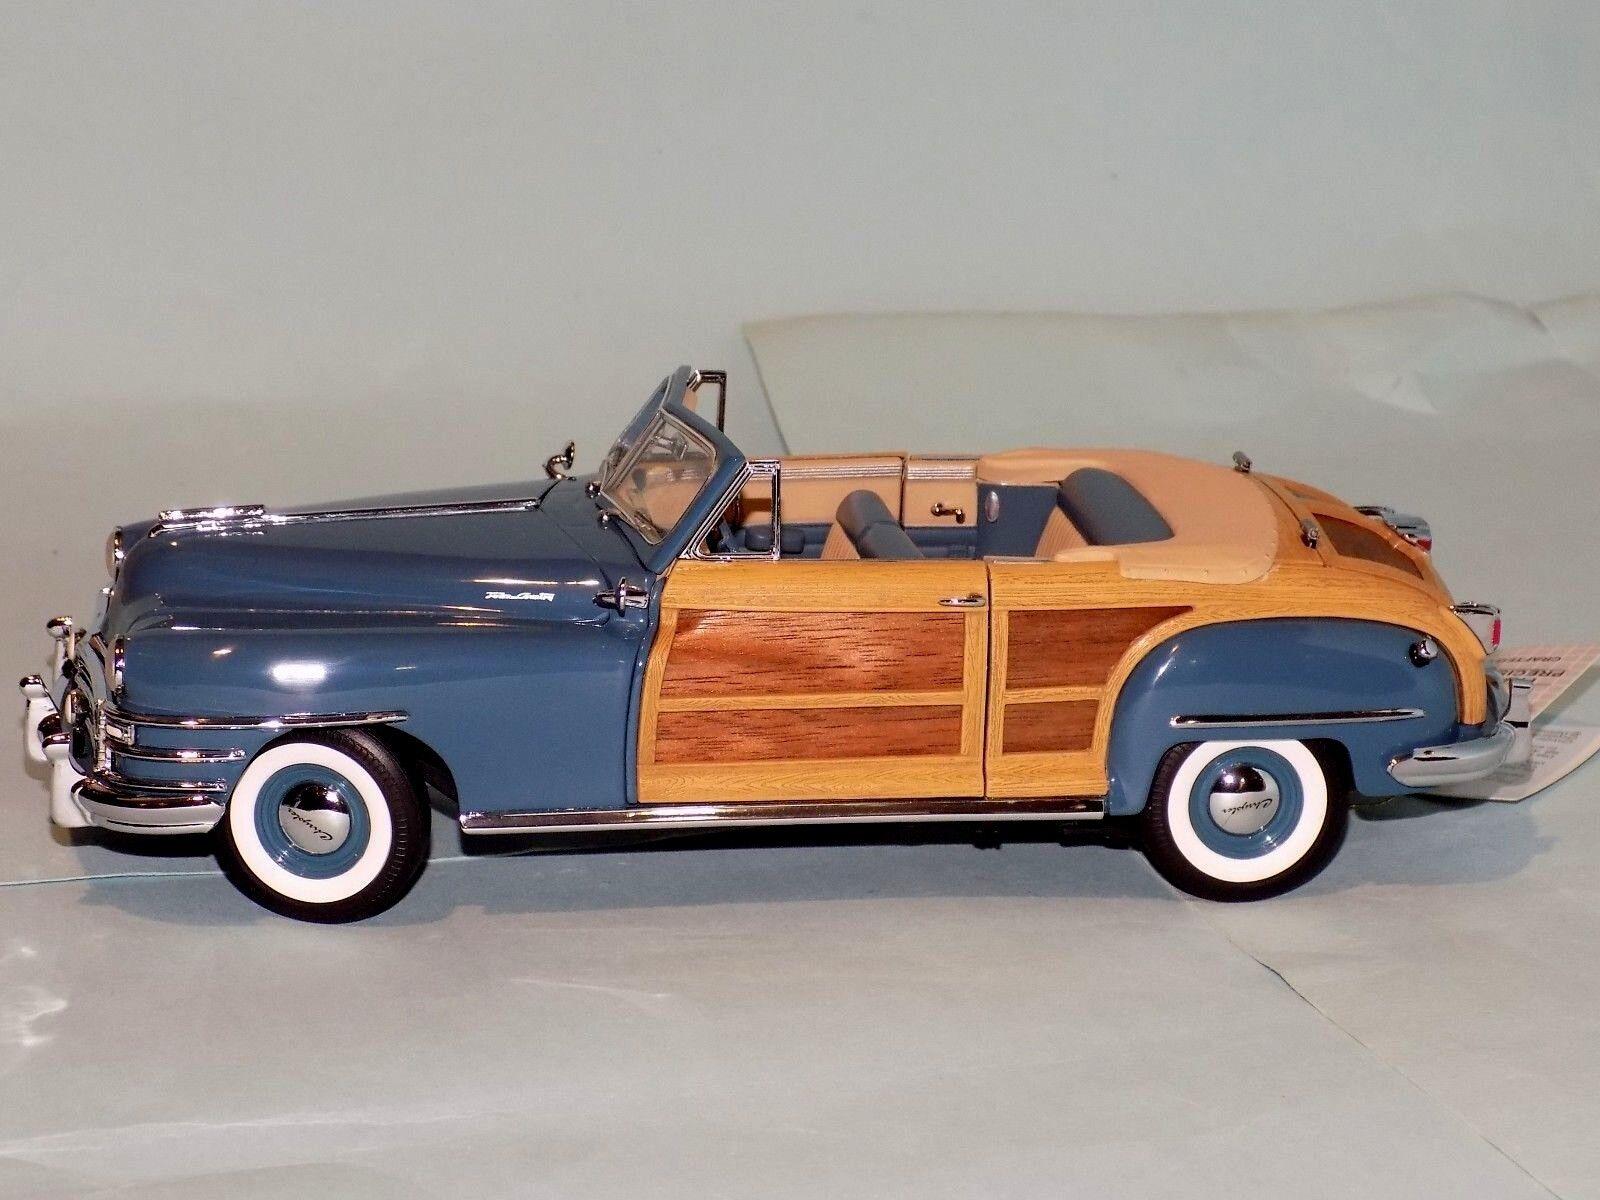 Chrysler town and country fressie cabrio 1948 von franklin mint b11d165 24